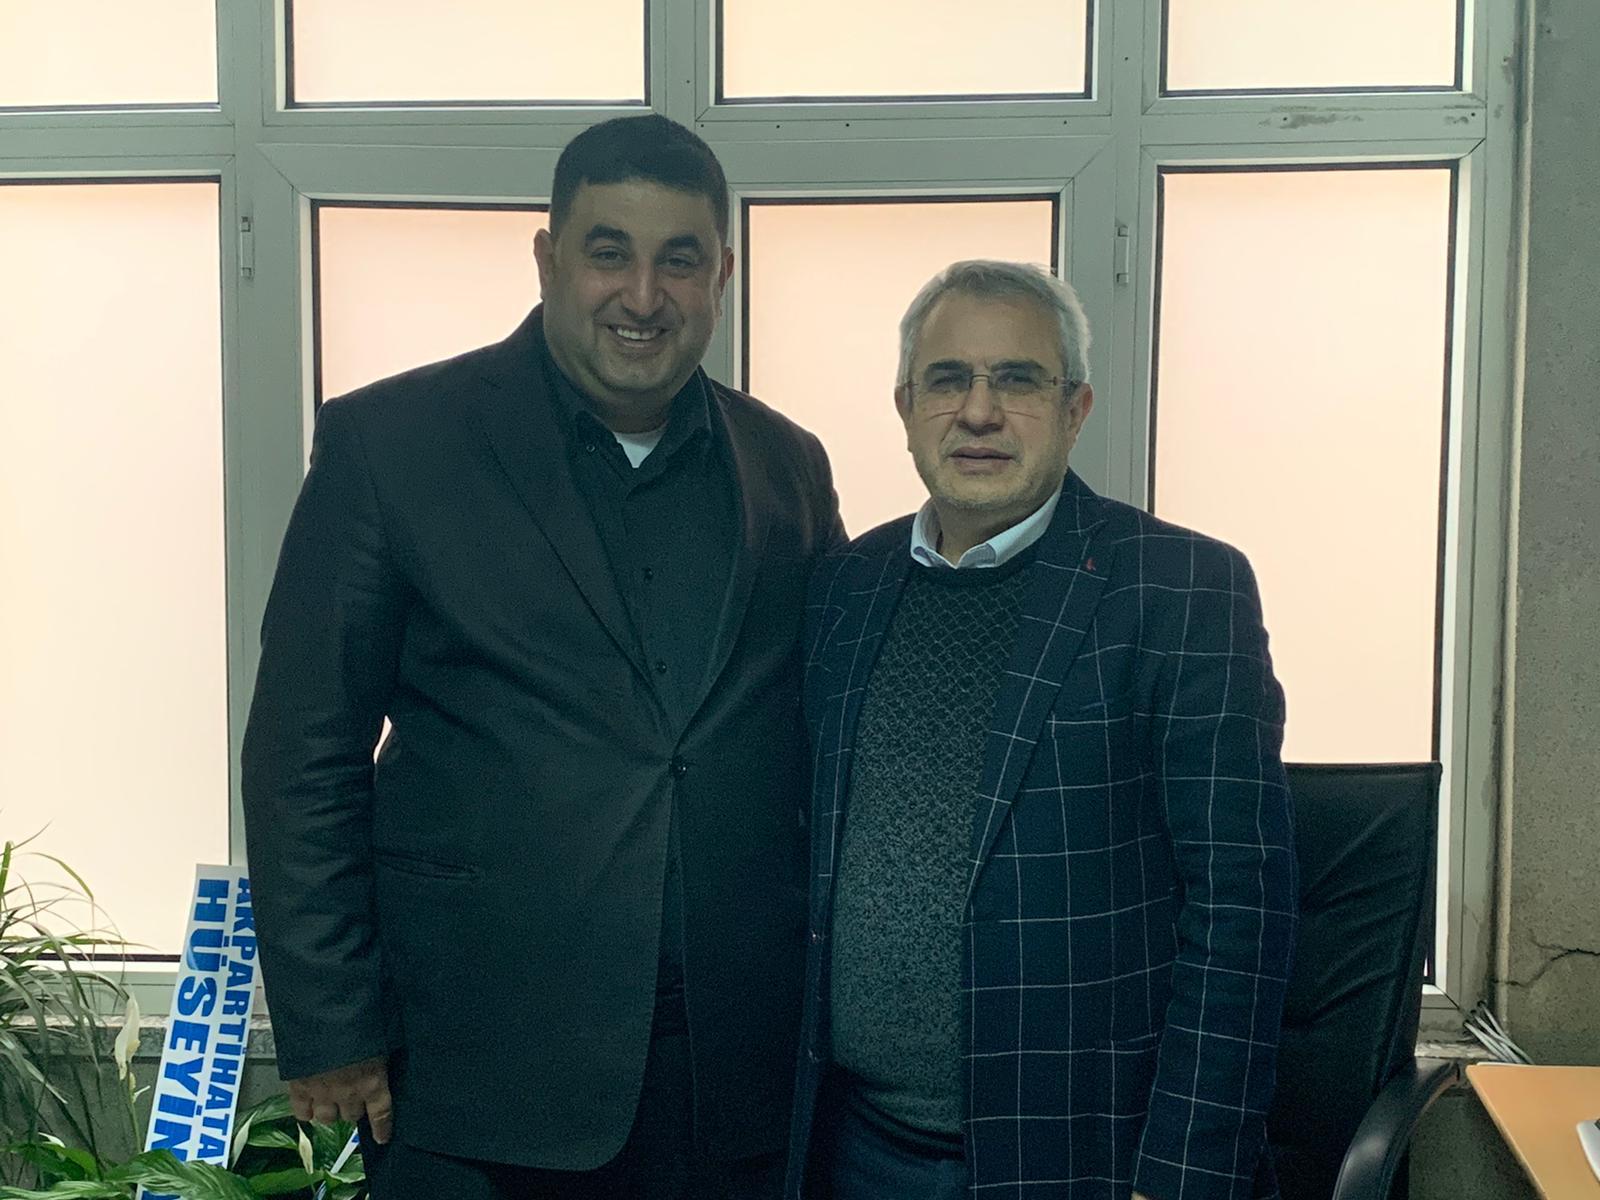 CHP'Lİ MECLİS ÜYESİNDEN GAZETEMİZE KUTLAMA